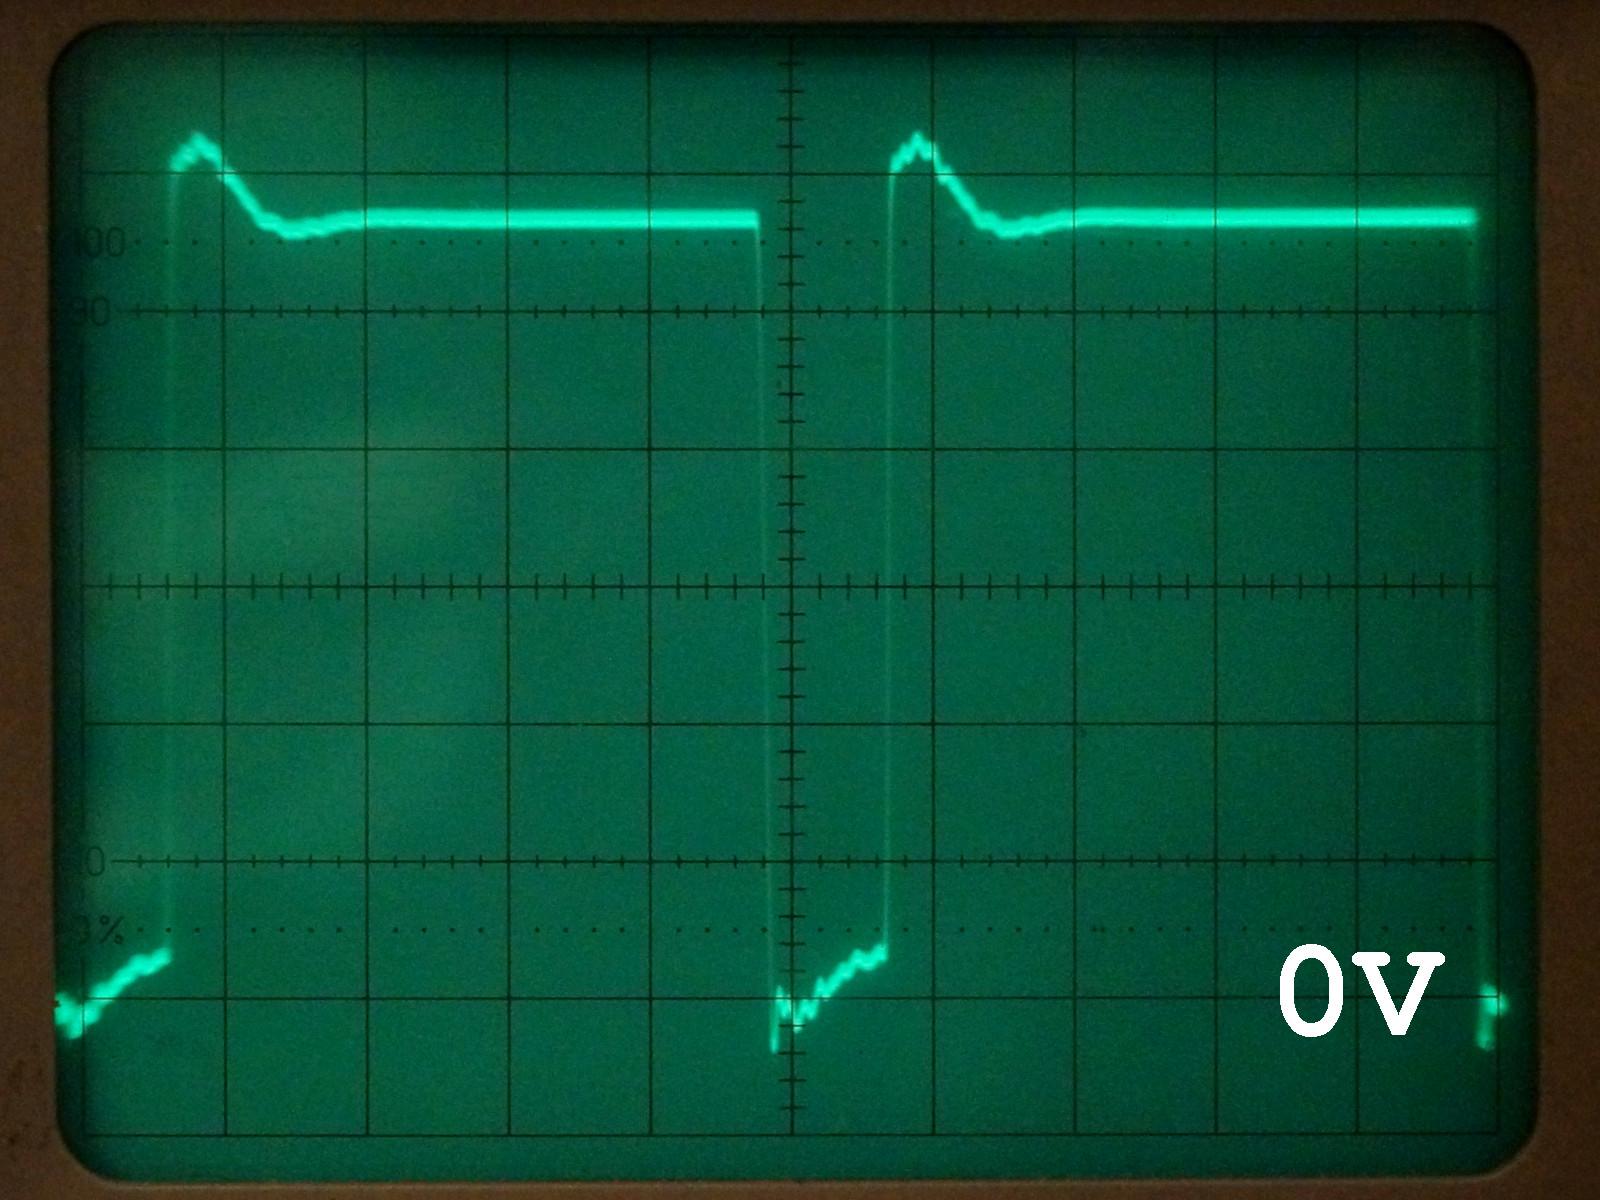 sensors_final-circuit-post-R1-inductor-effect.jpg